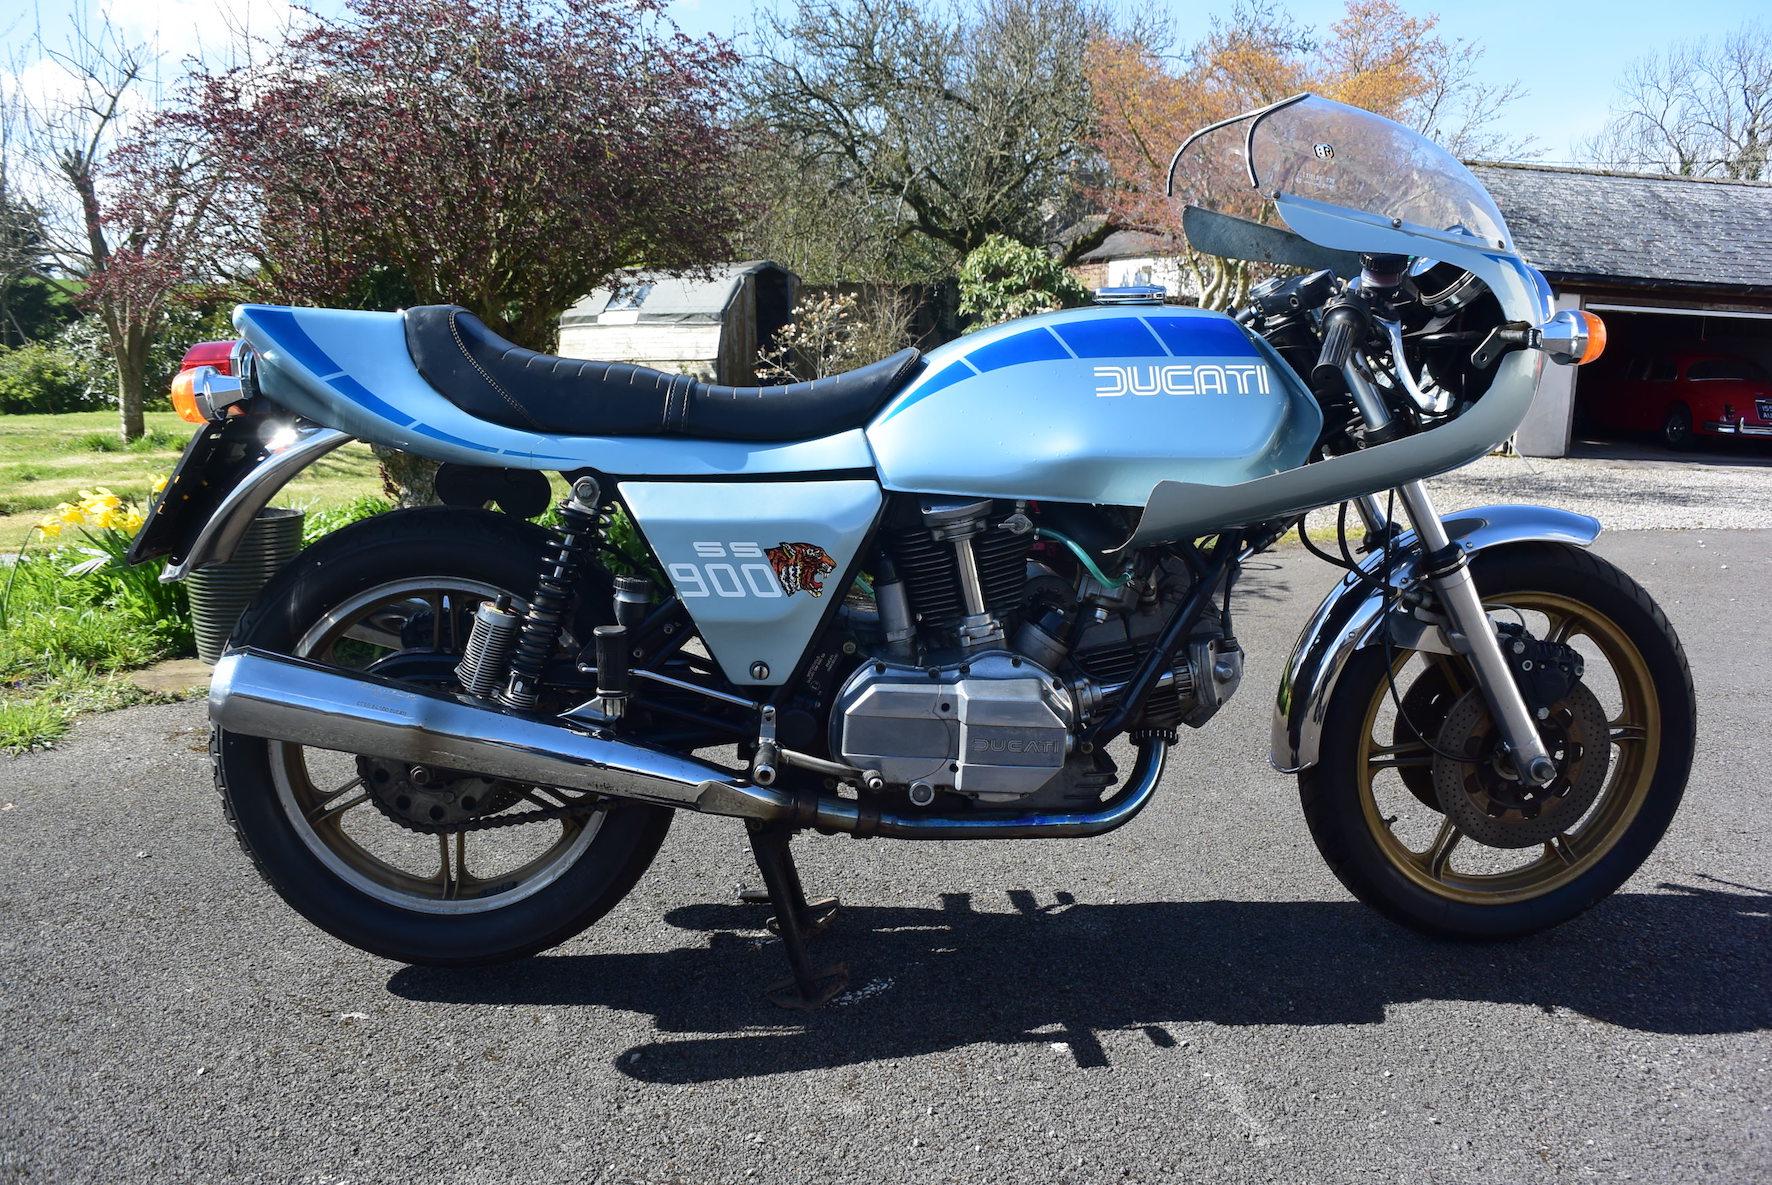 1980 Ducati 900SS Darmah racer bike